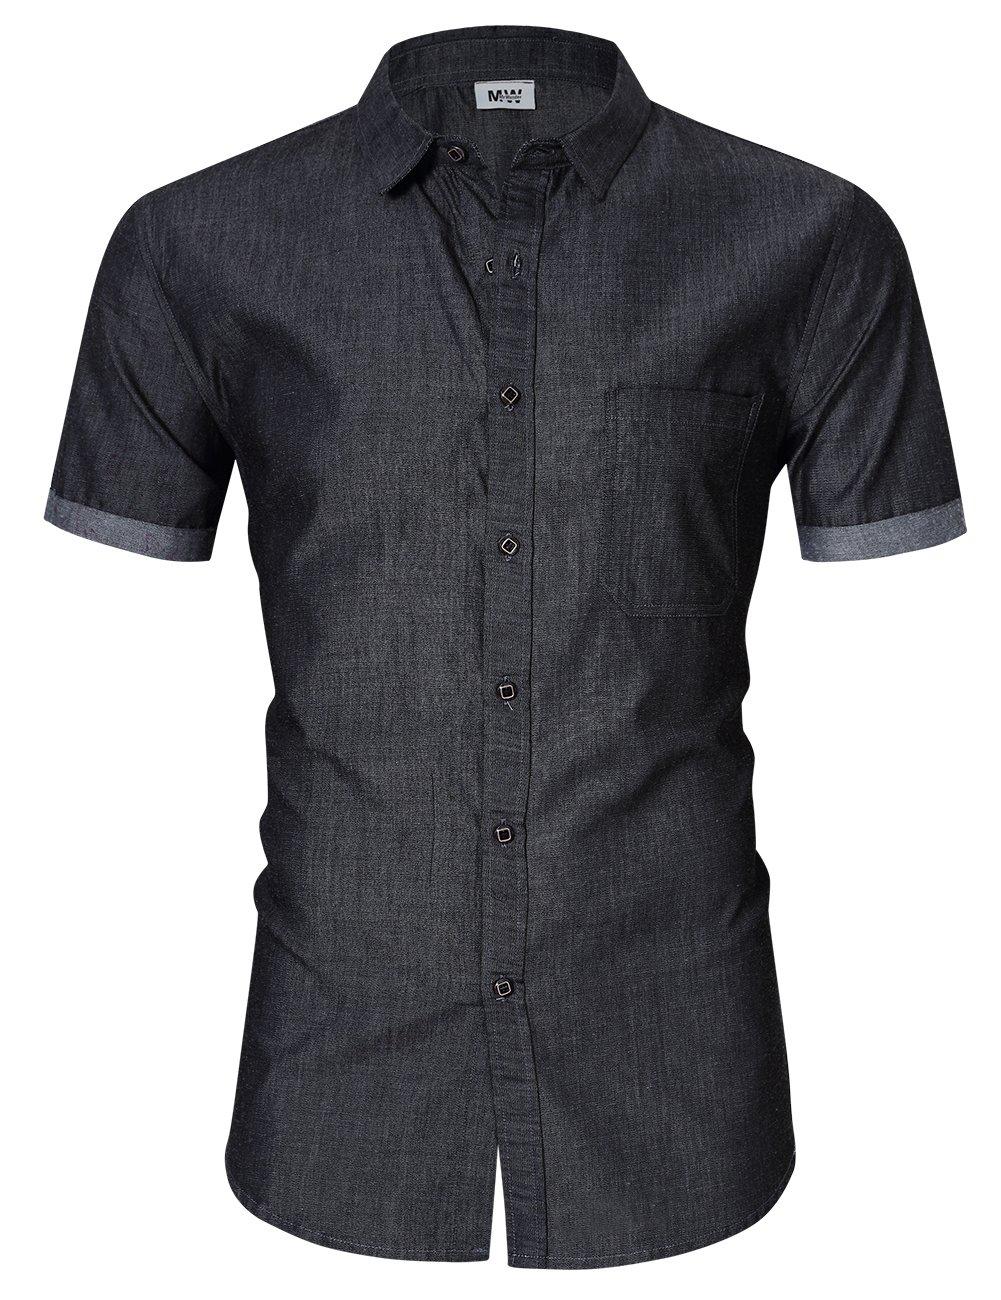 MrWonder メンズカジュアルスリムフィット長袖ボタンダウンドレスシャツ デニムシャツ B072BDD4HS XL|グレー グレー XL